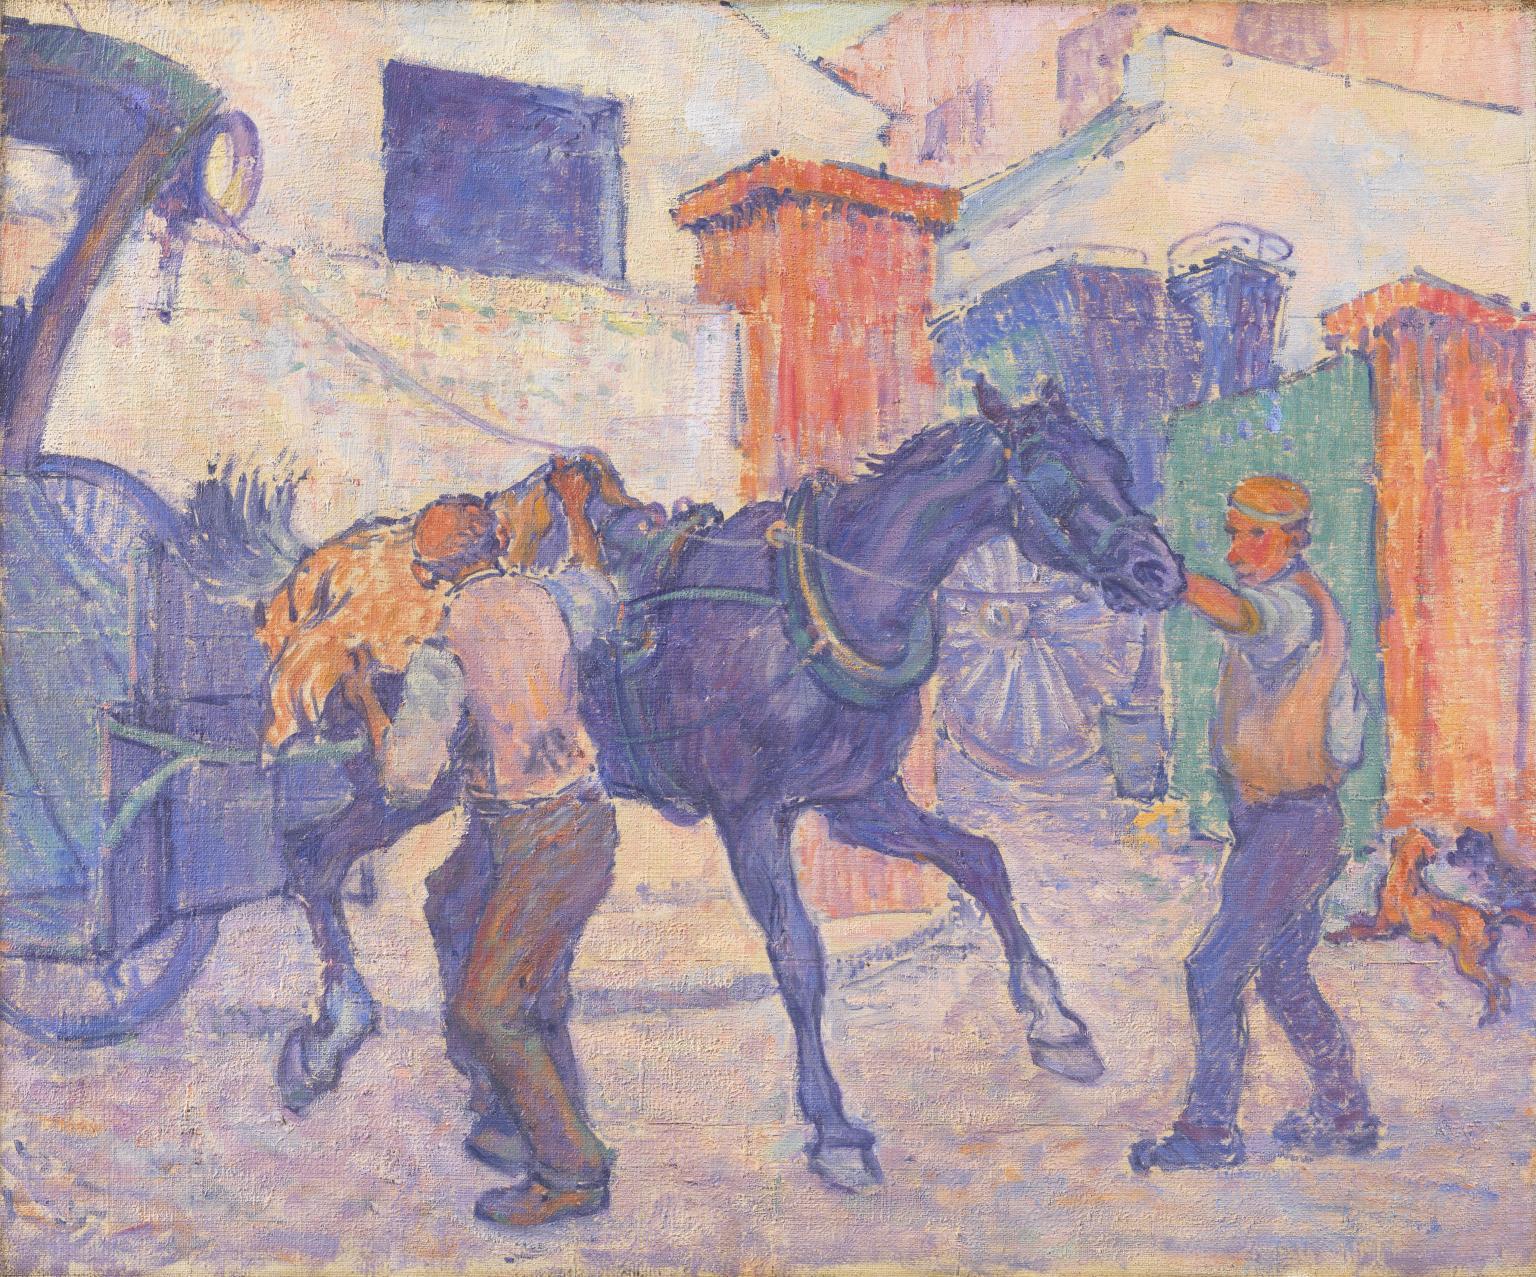 Robert Bevan The Cab Horse c. 1910 artwork